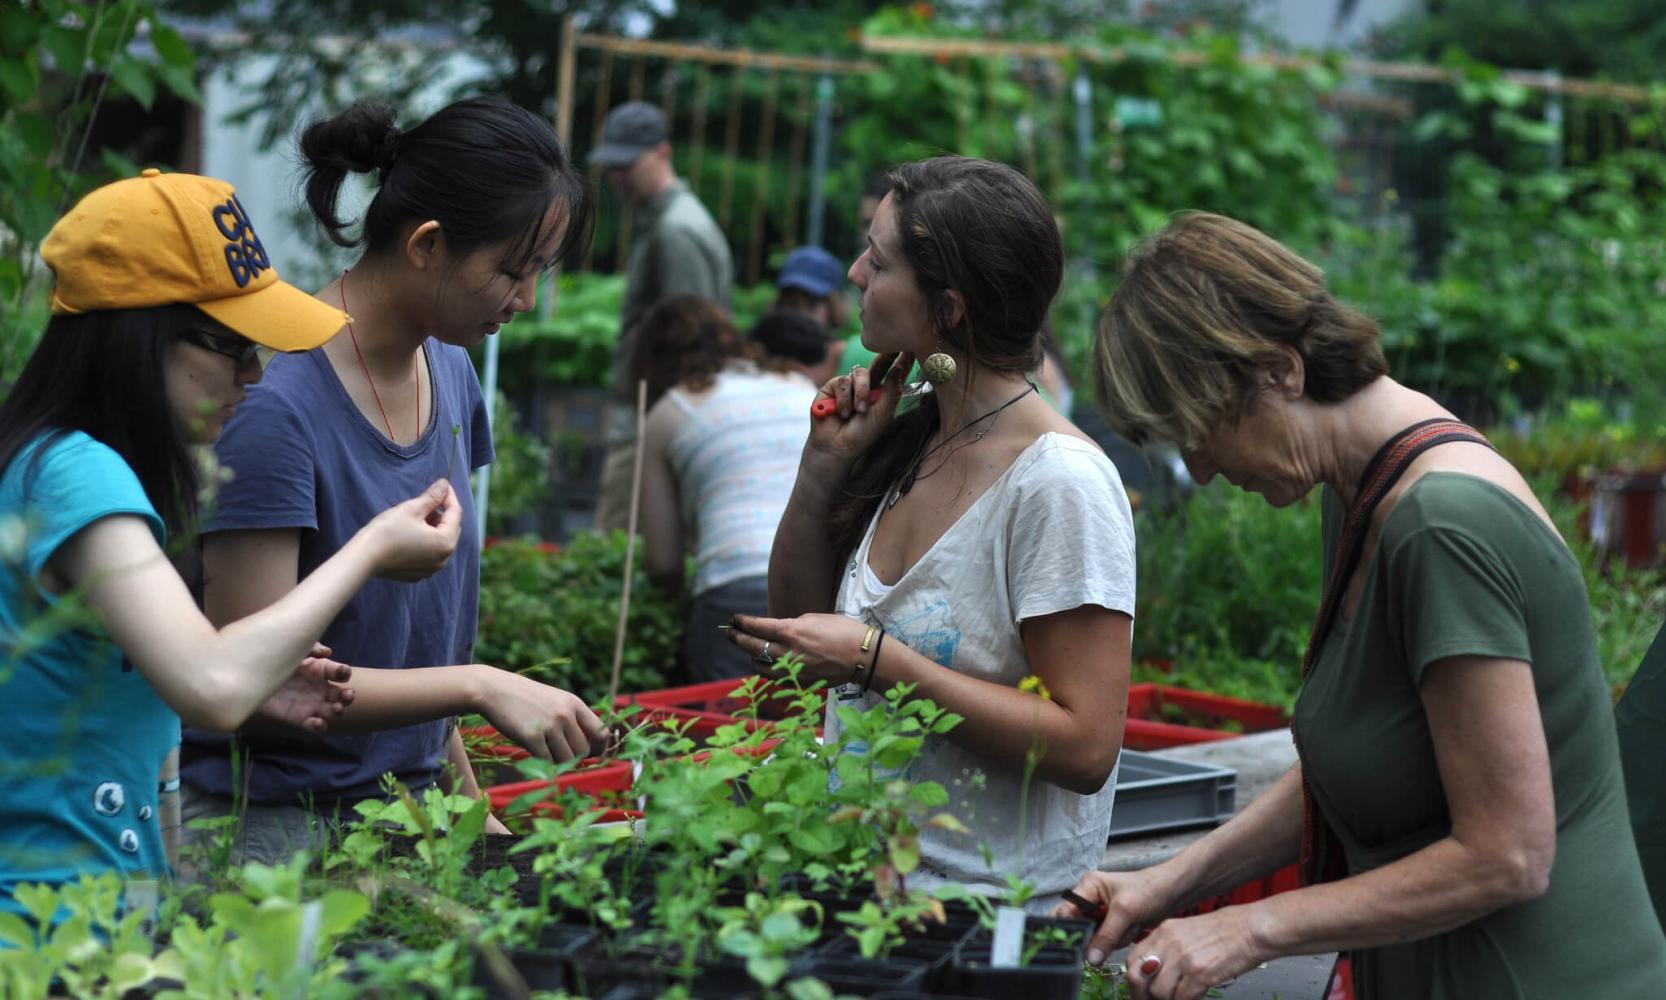 Pflanzen selber anbauen